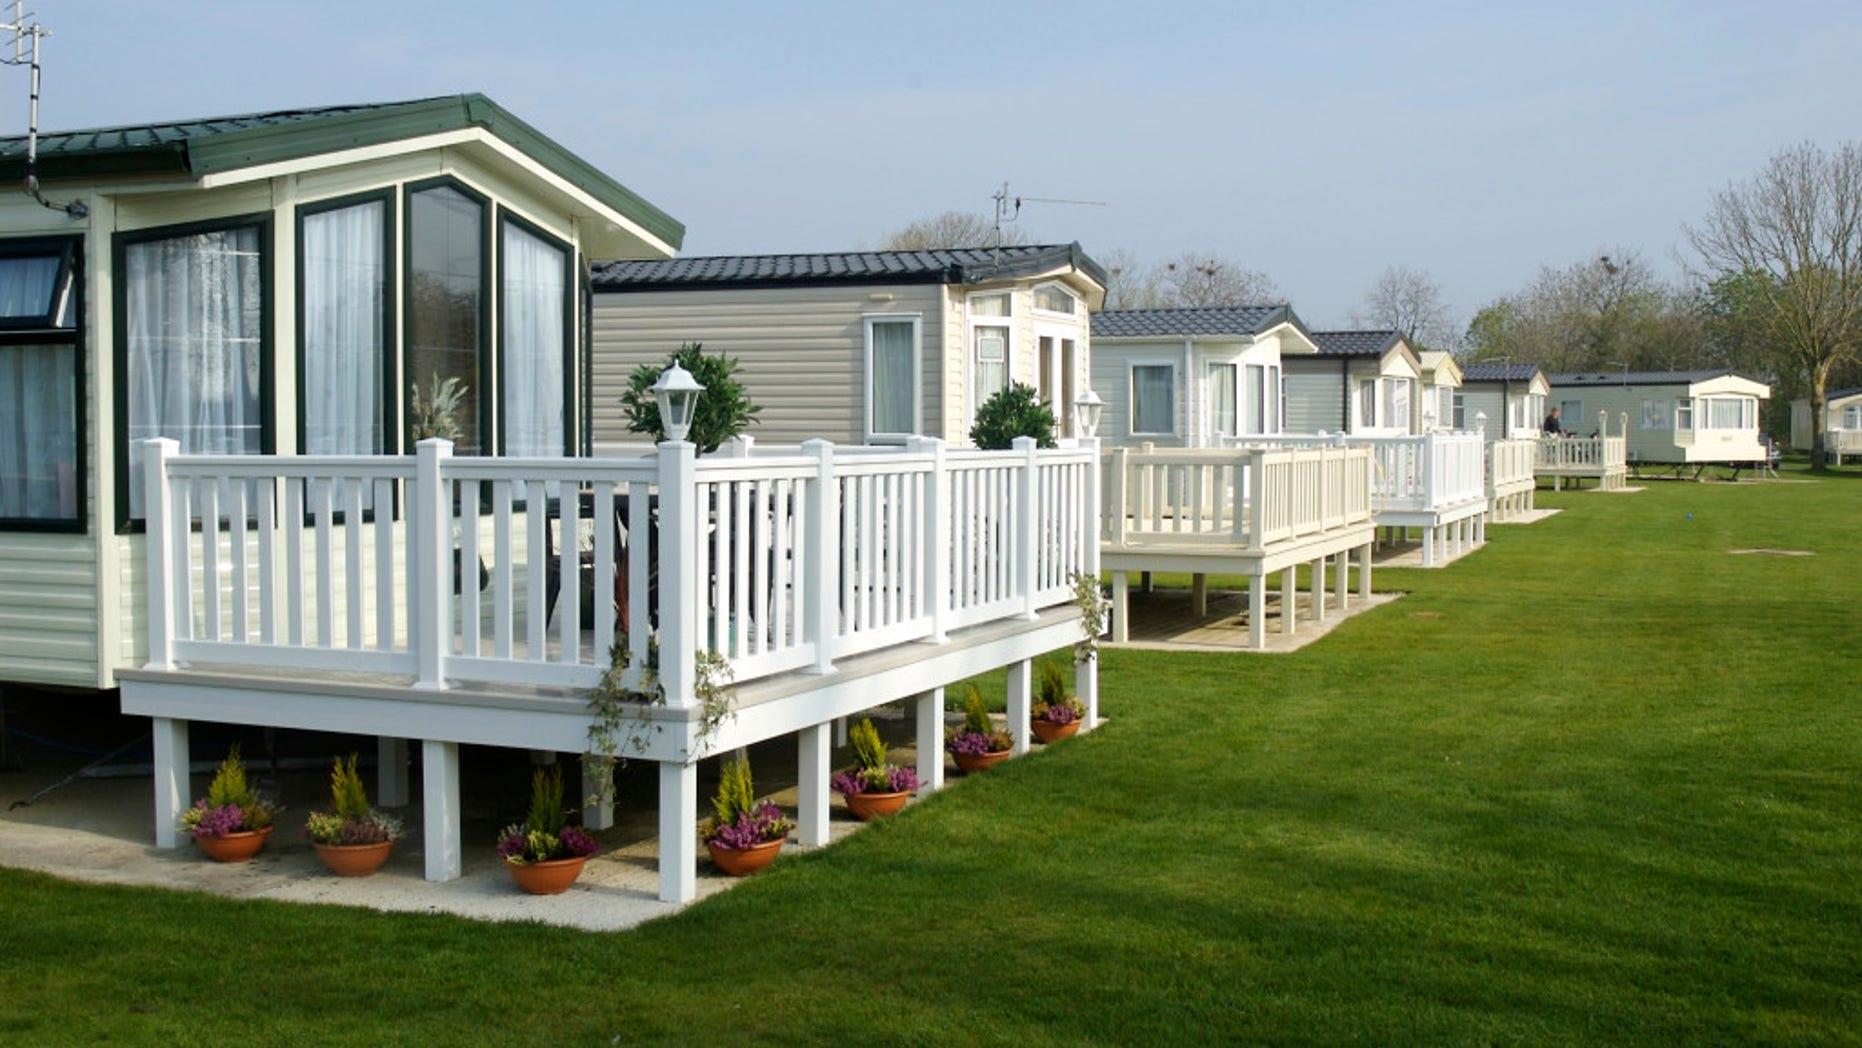 Basics of land lease deals